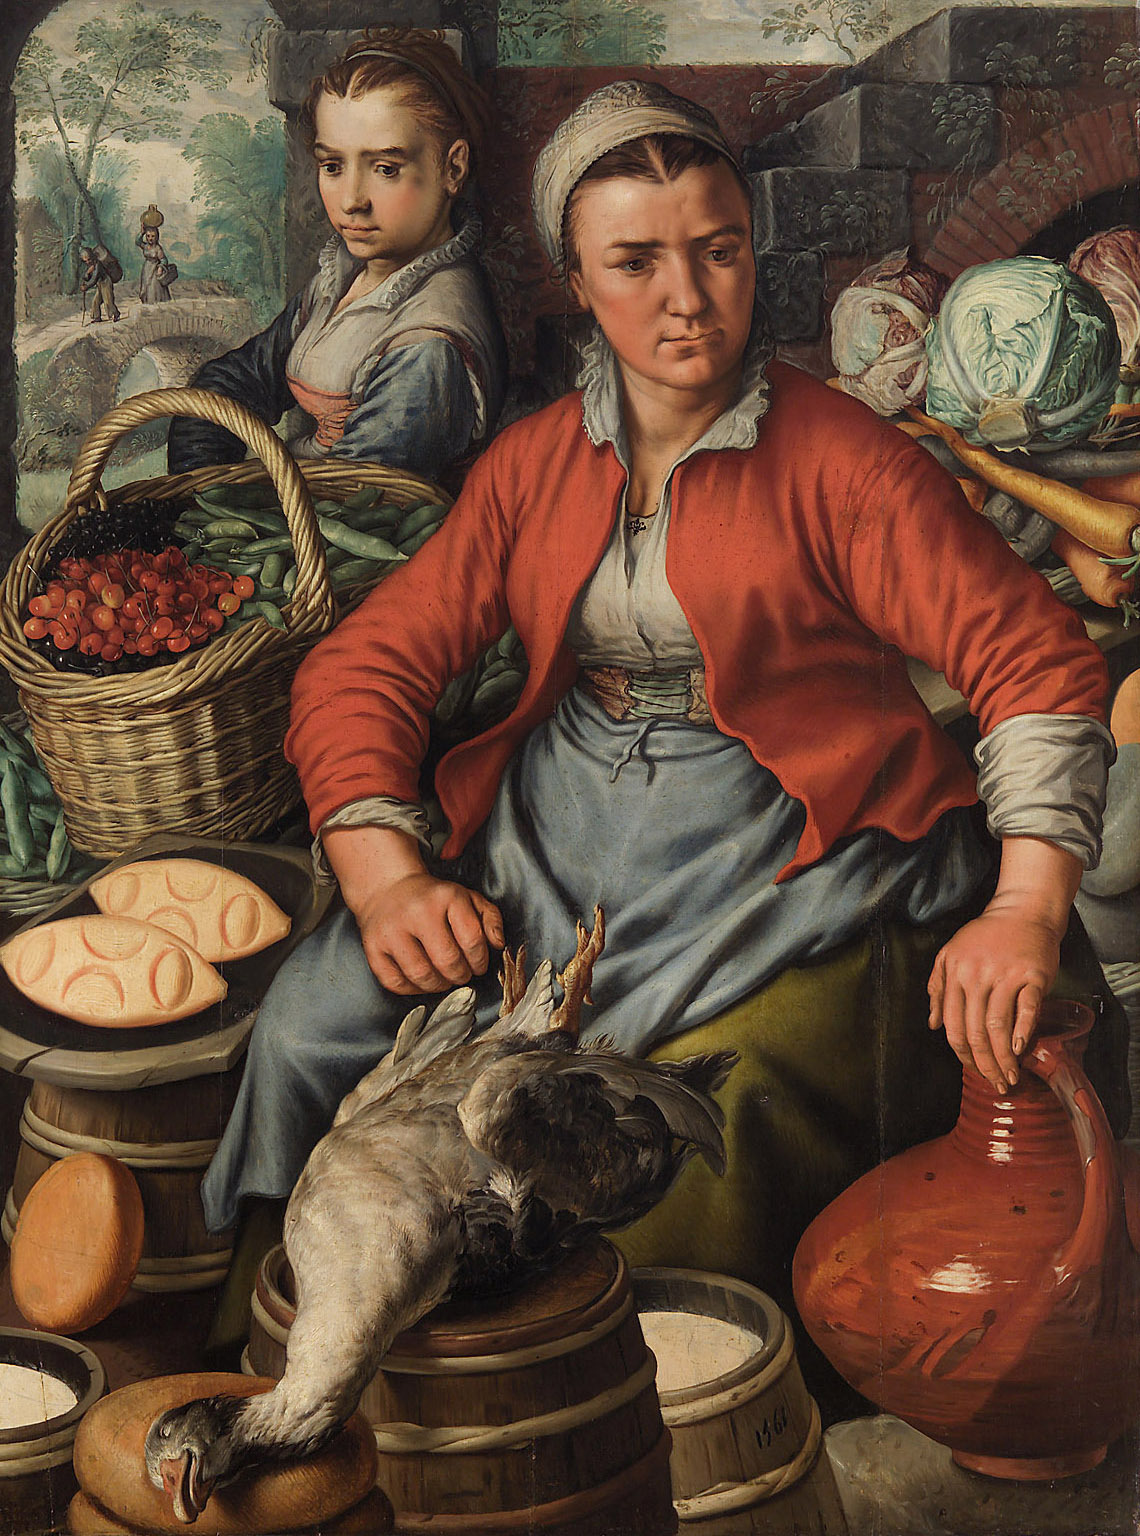 Marktfrau von Joachim Beuckelaer